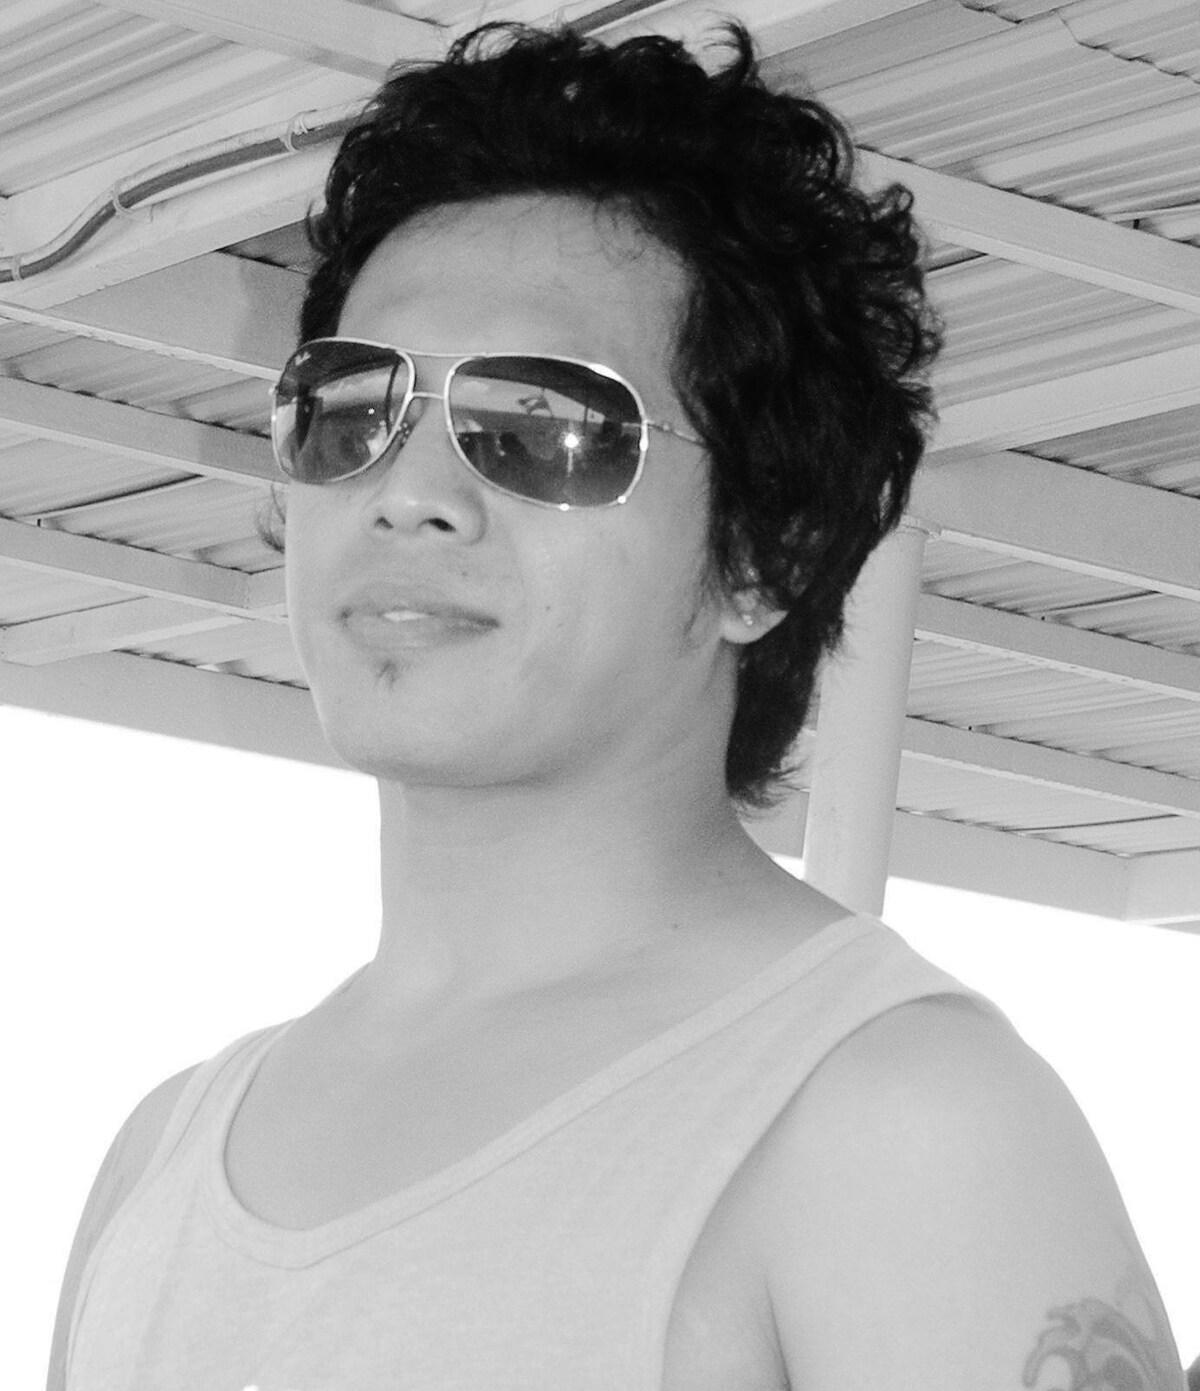 Jay from South Denpasar